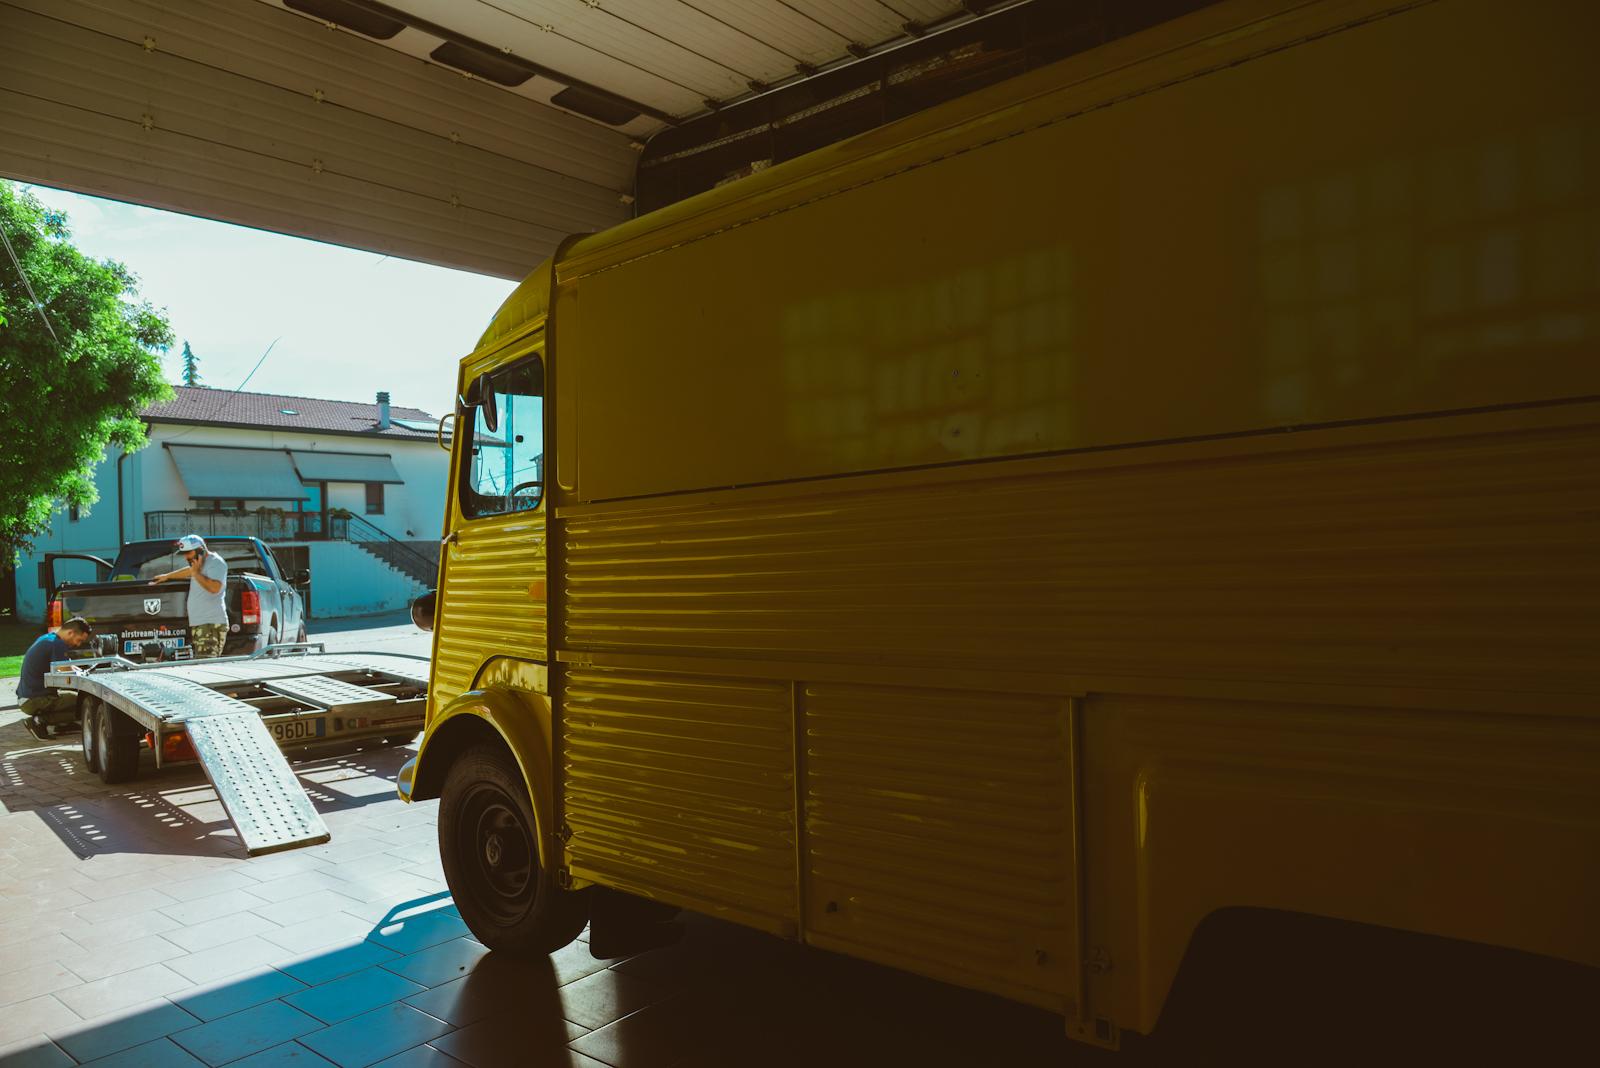 citroen HY truck by officine vivaldi 11.